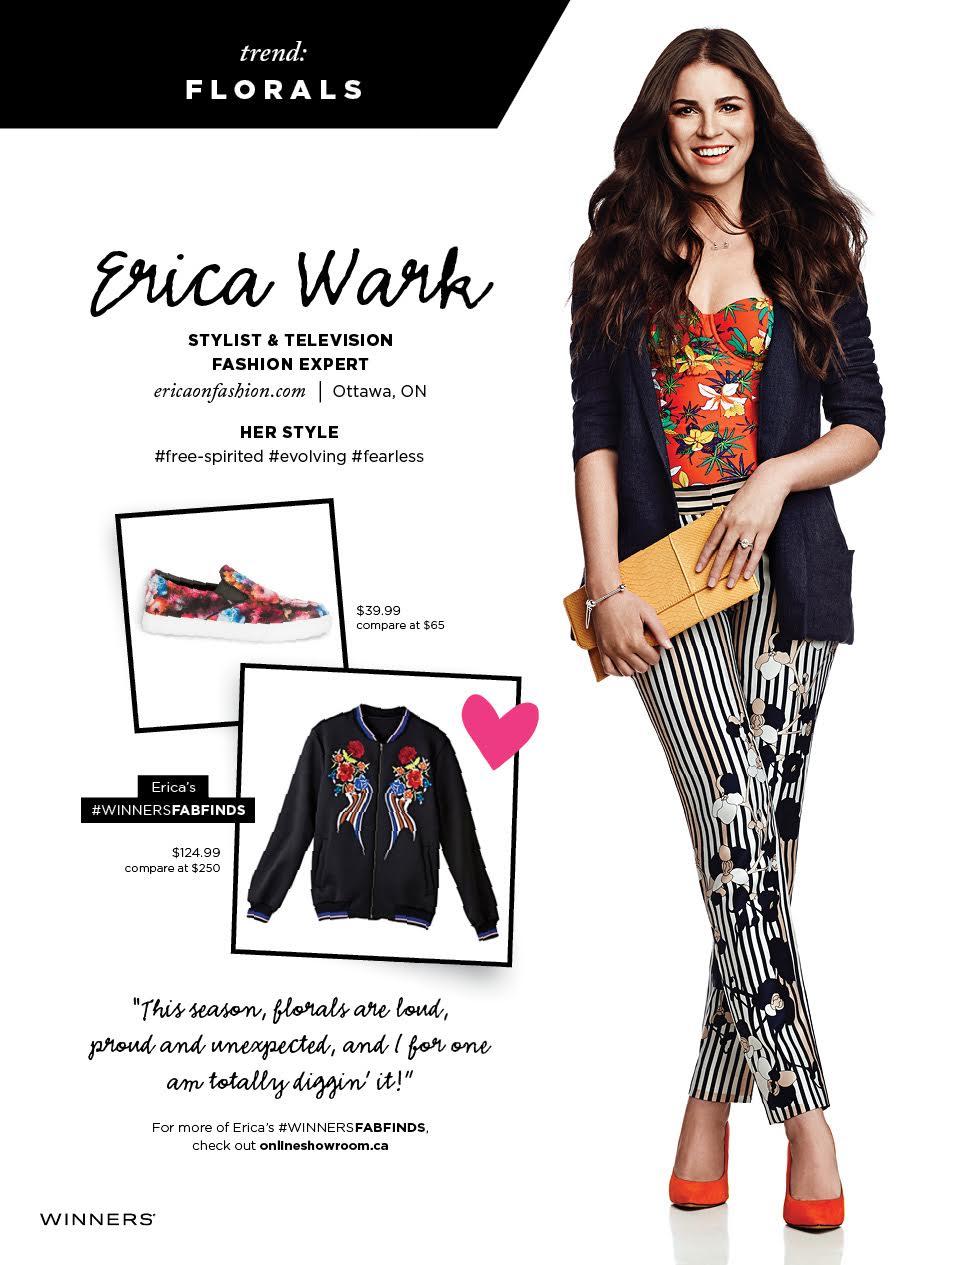 erica-wark-winners-20151